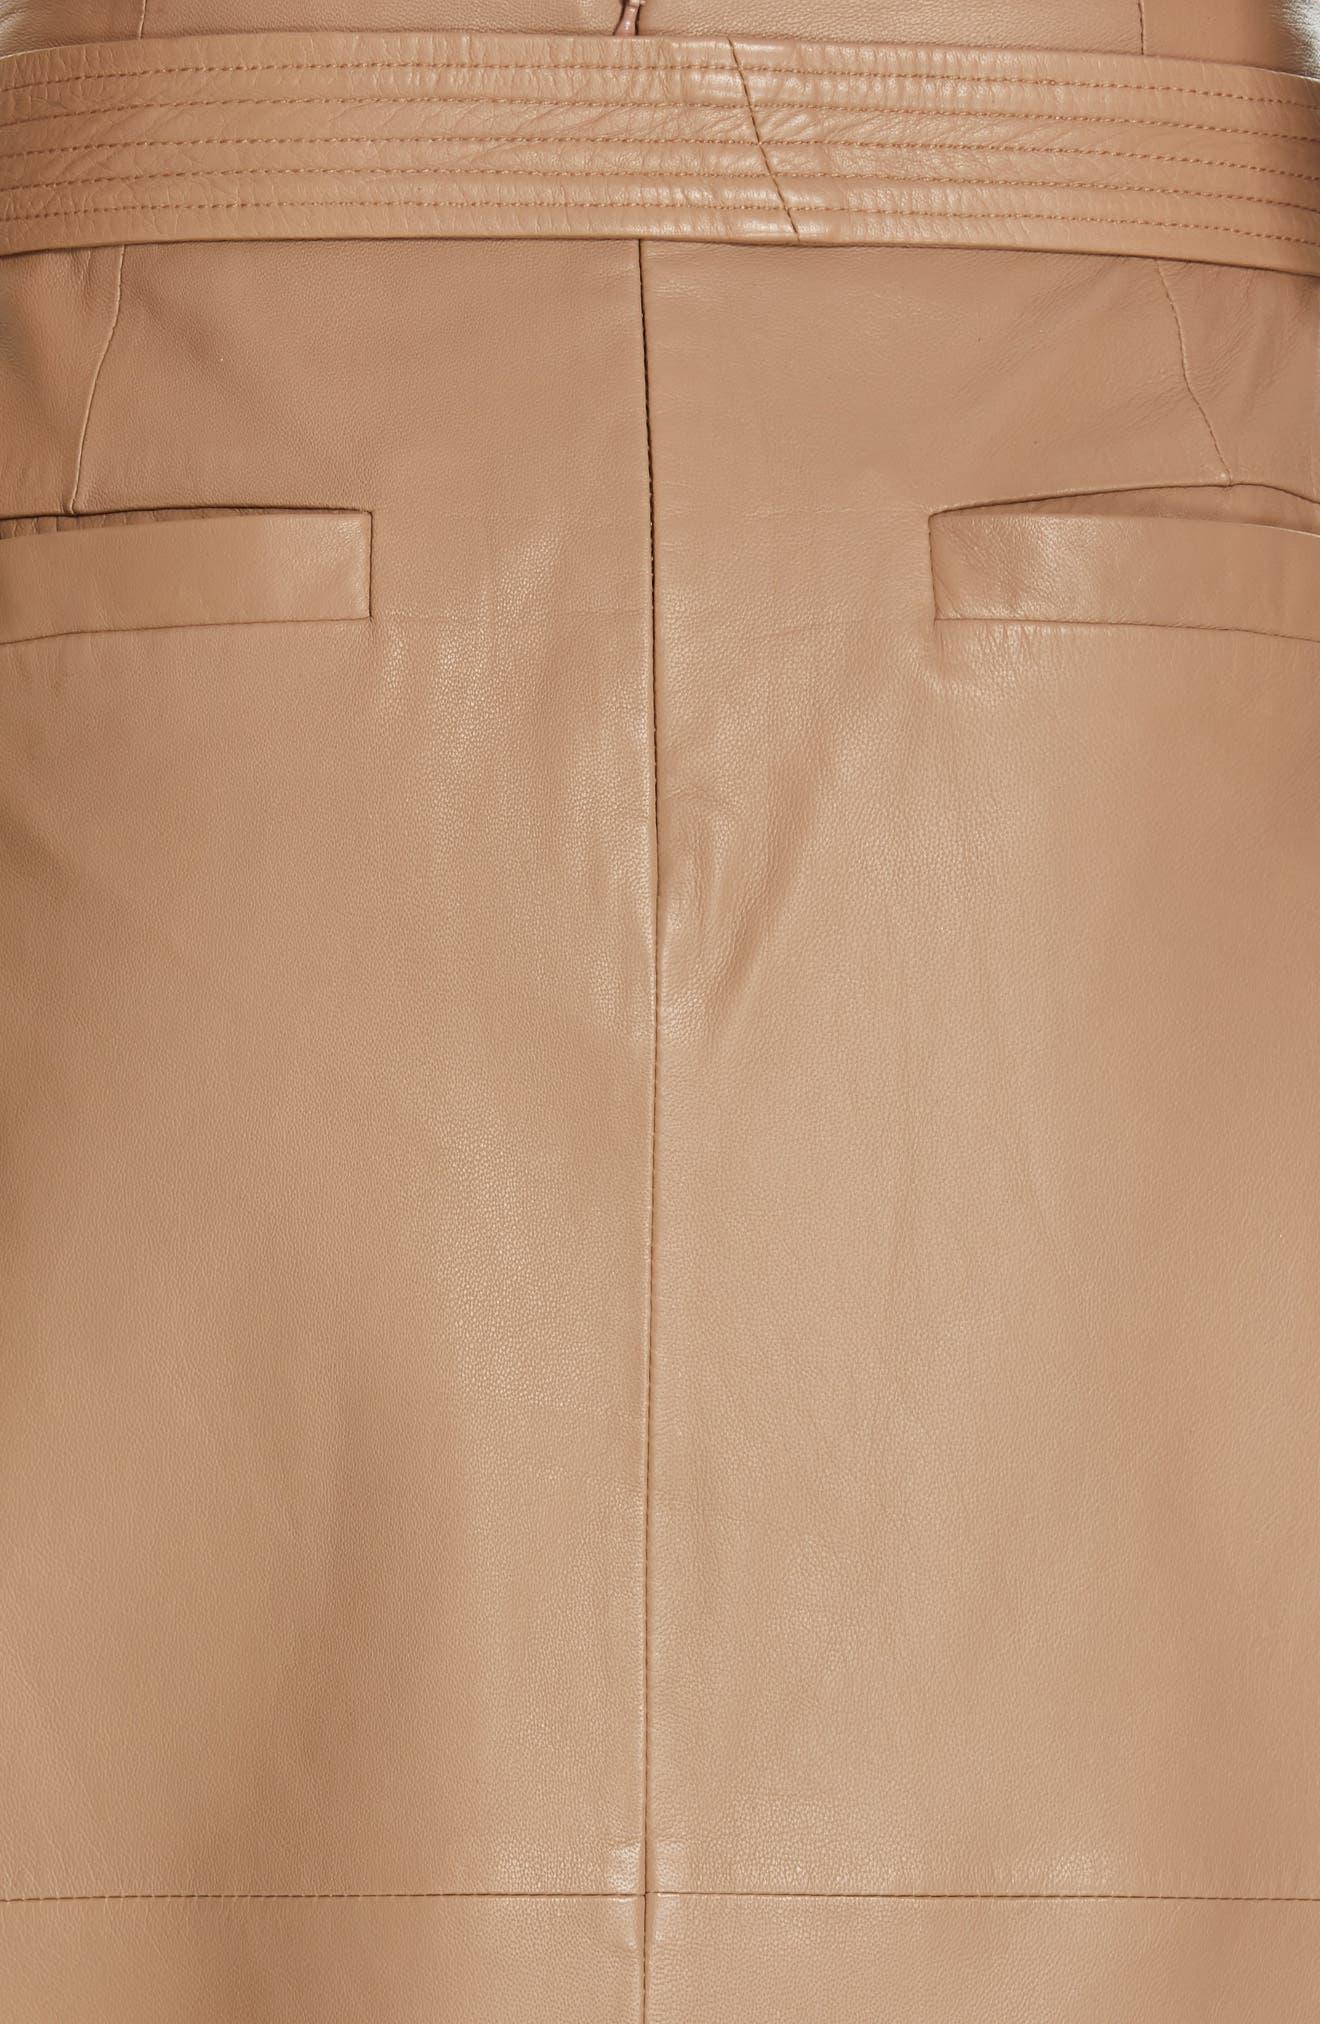 Alouetta Leather Skirt,                             Alternate thumbnail 5, color,                             BOIS